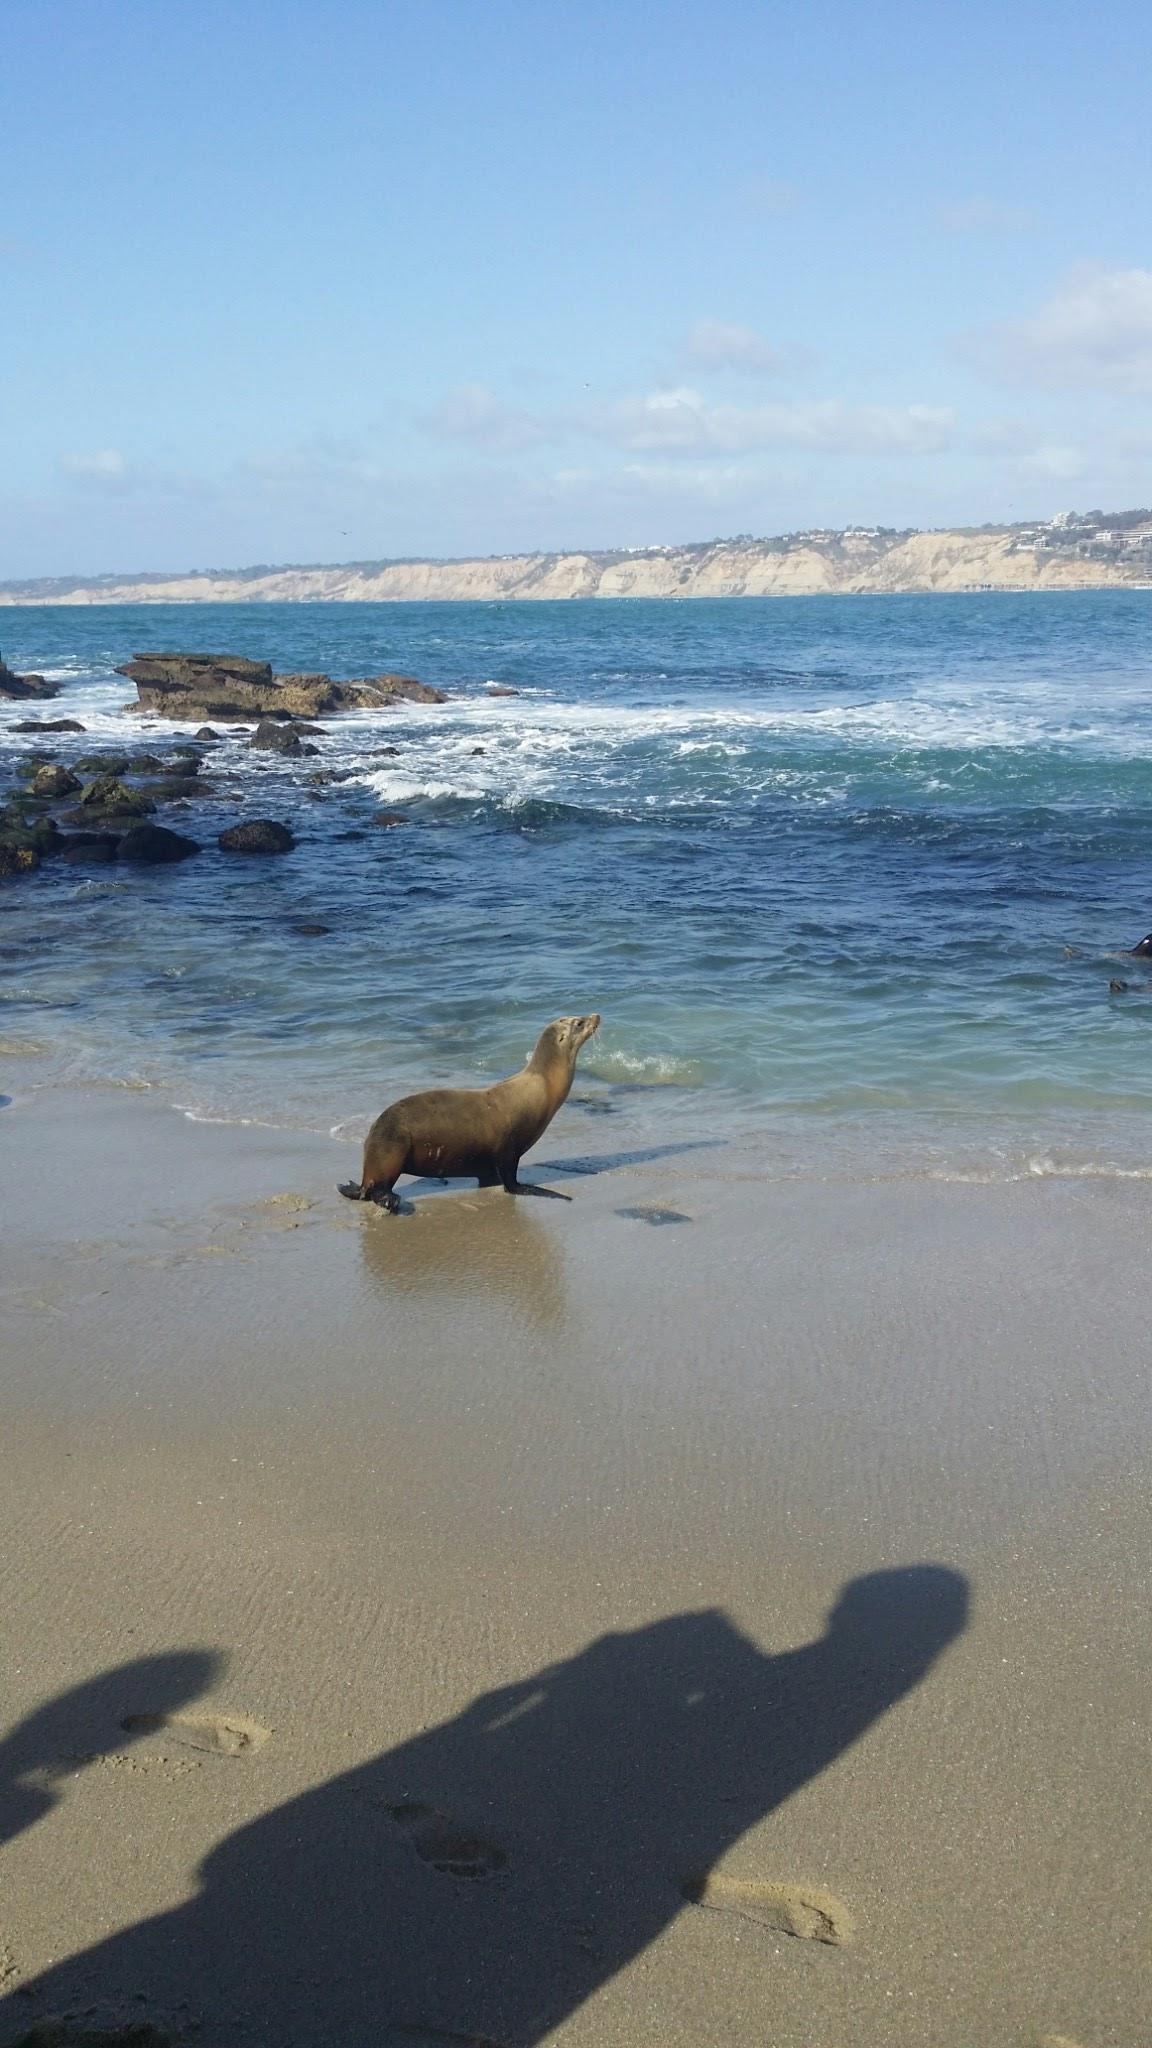 Sea lion at La Jolla Cove, San Diego